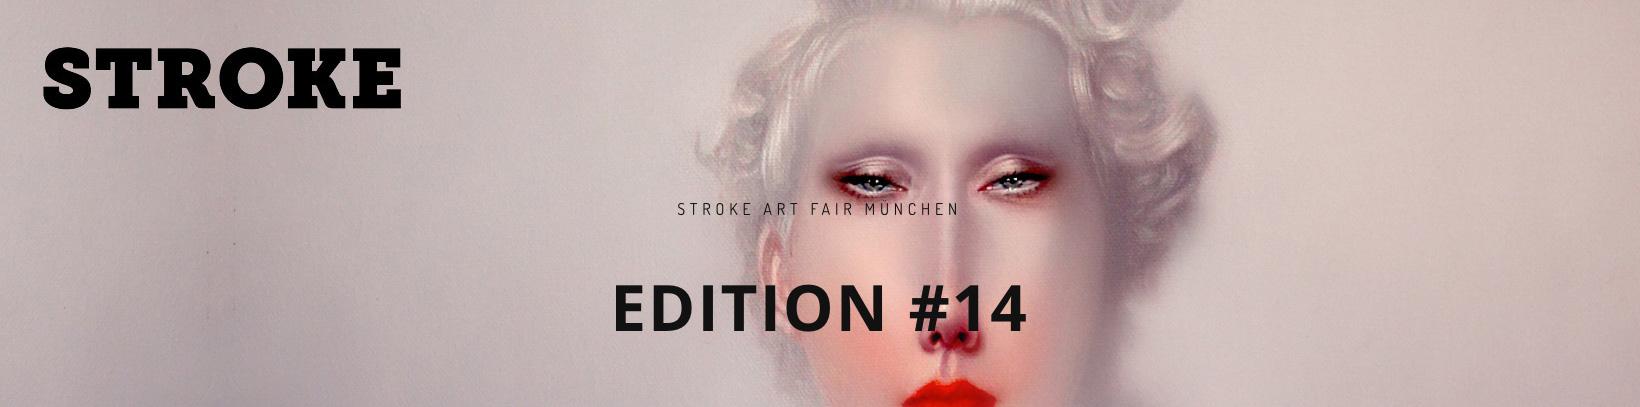 Stroke-art-fair